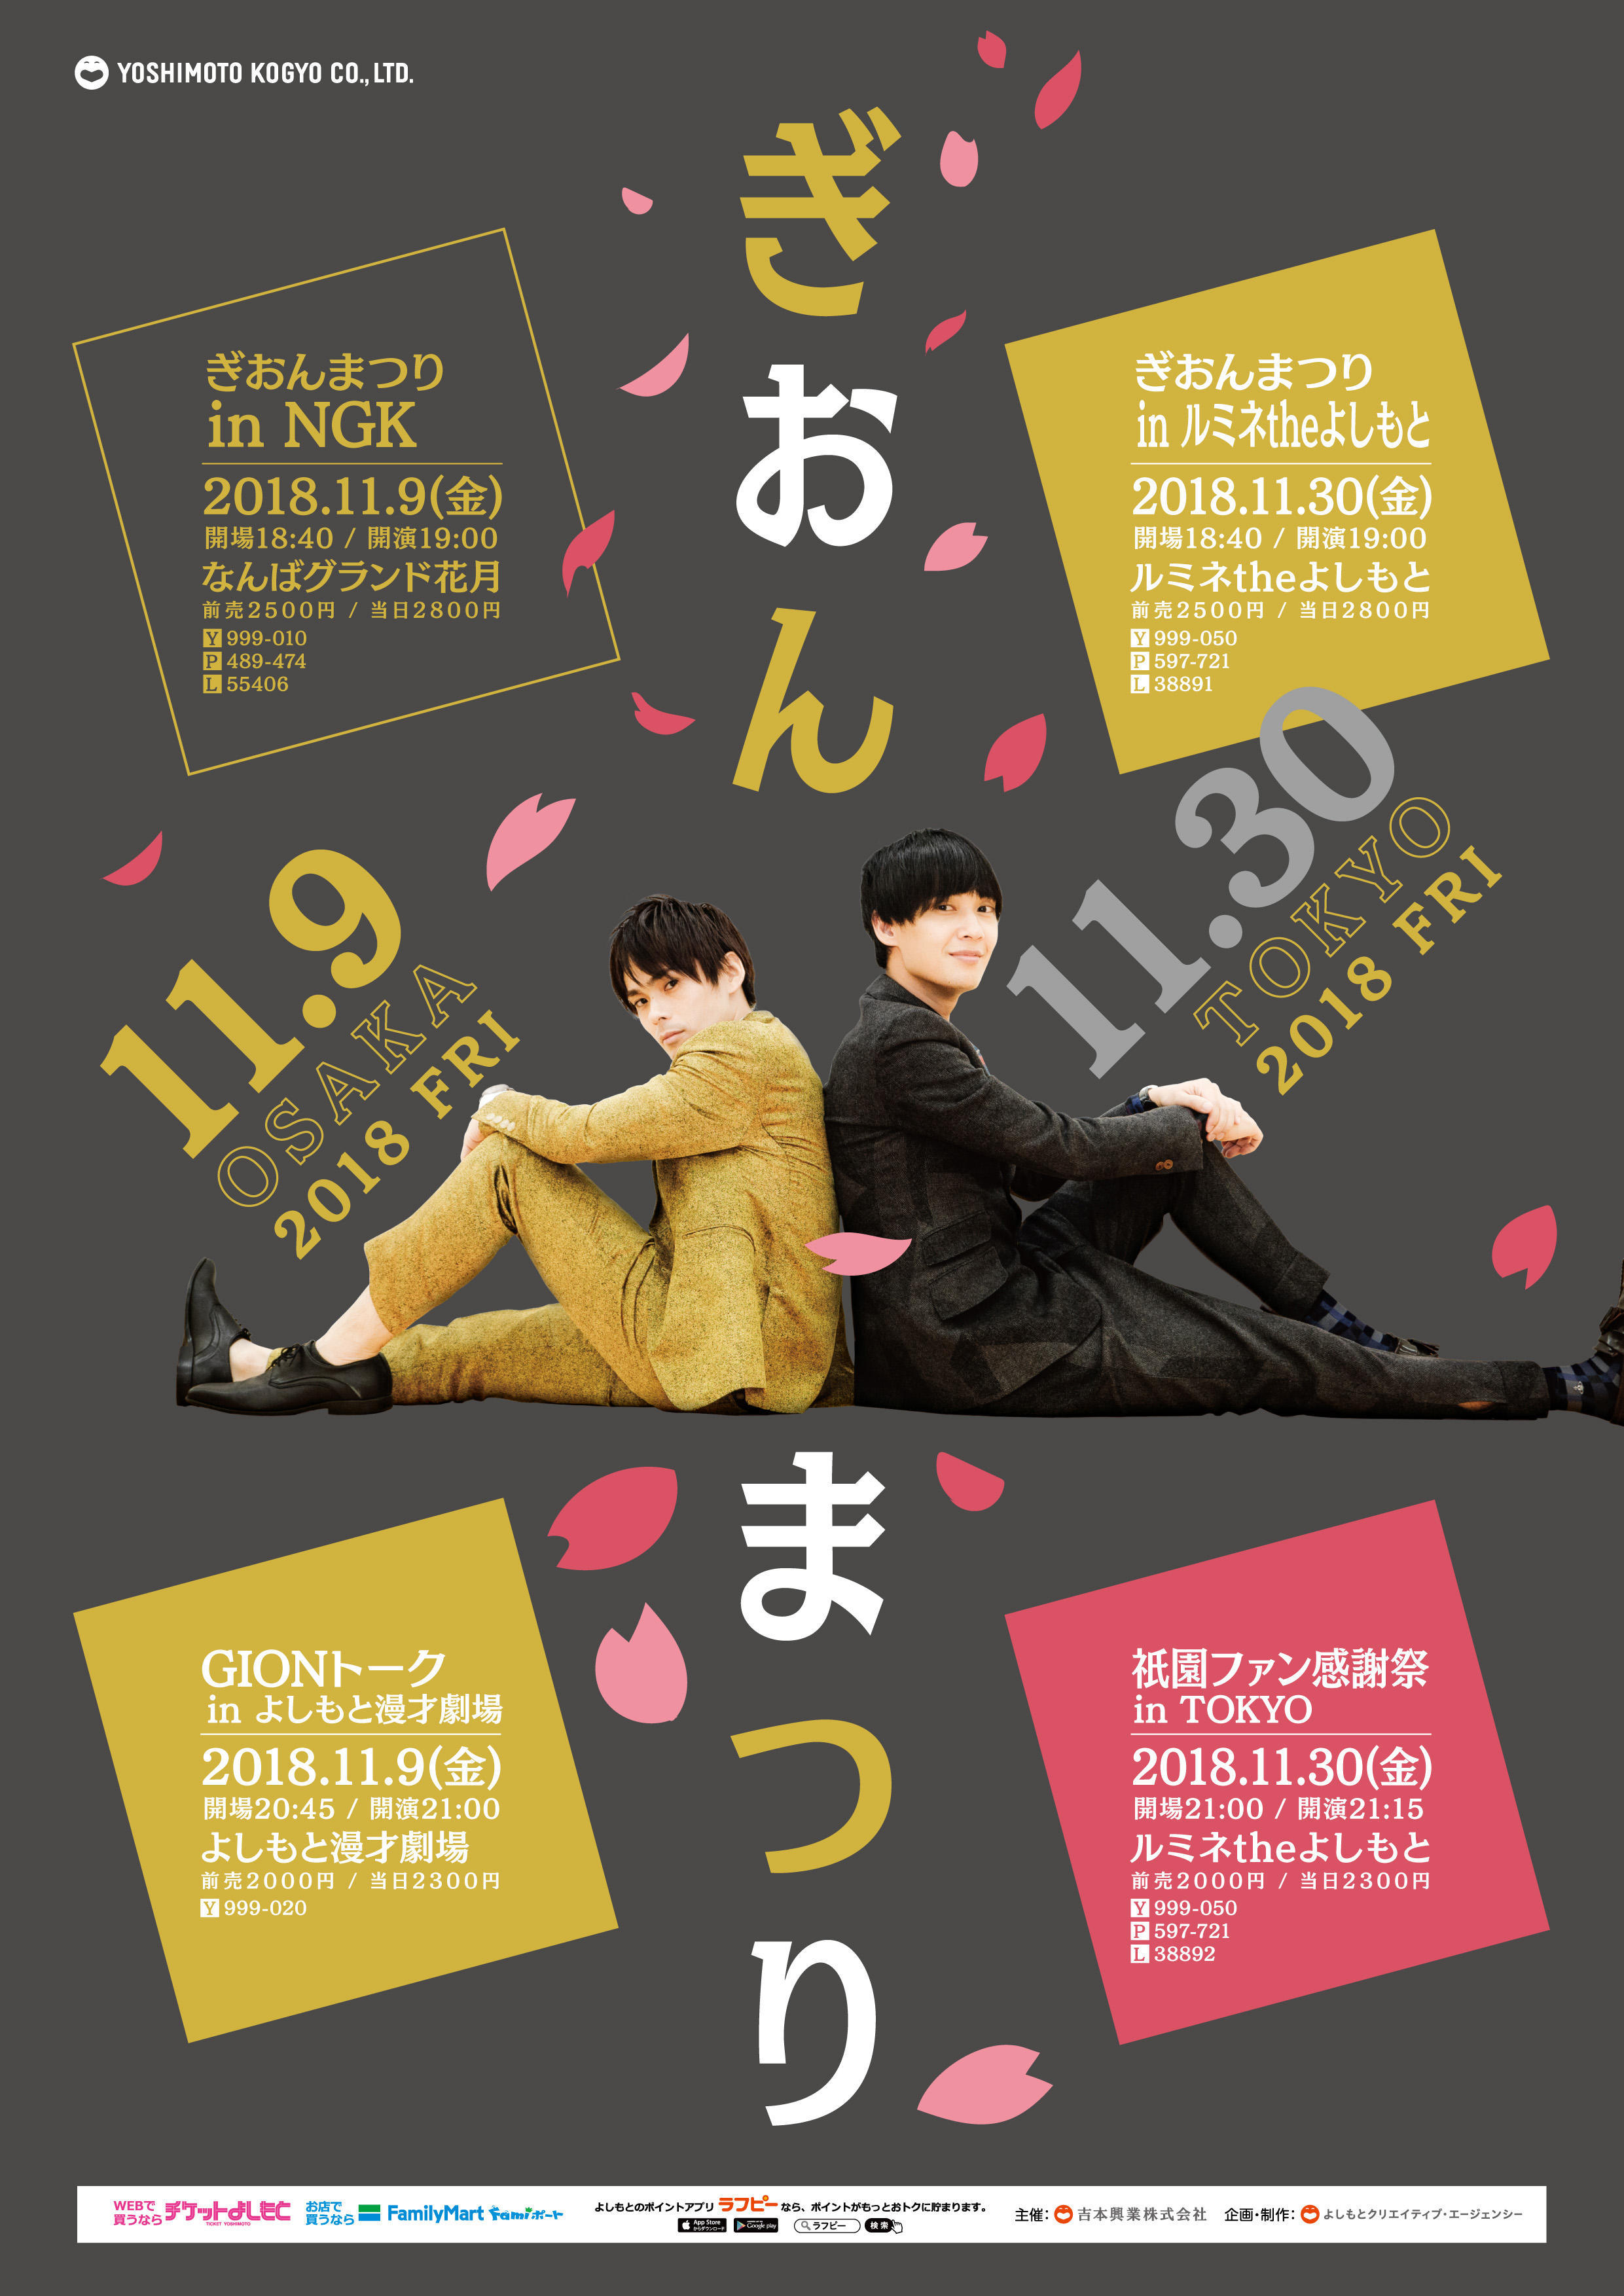 http://news.yoshimoto.co.jp/20180829221057-66260b23af9767eb172b5749d381746a5f59fac6.jpg